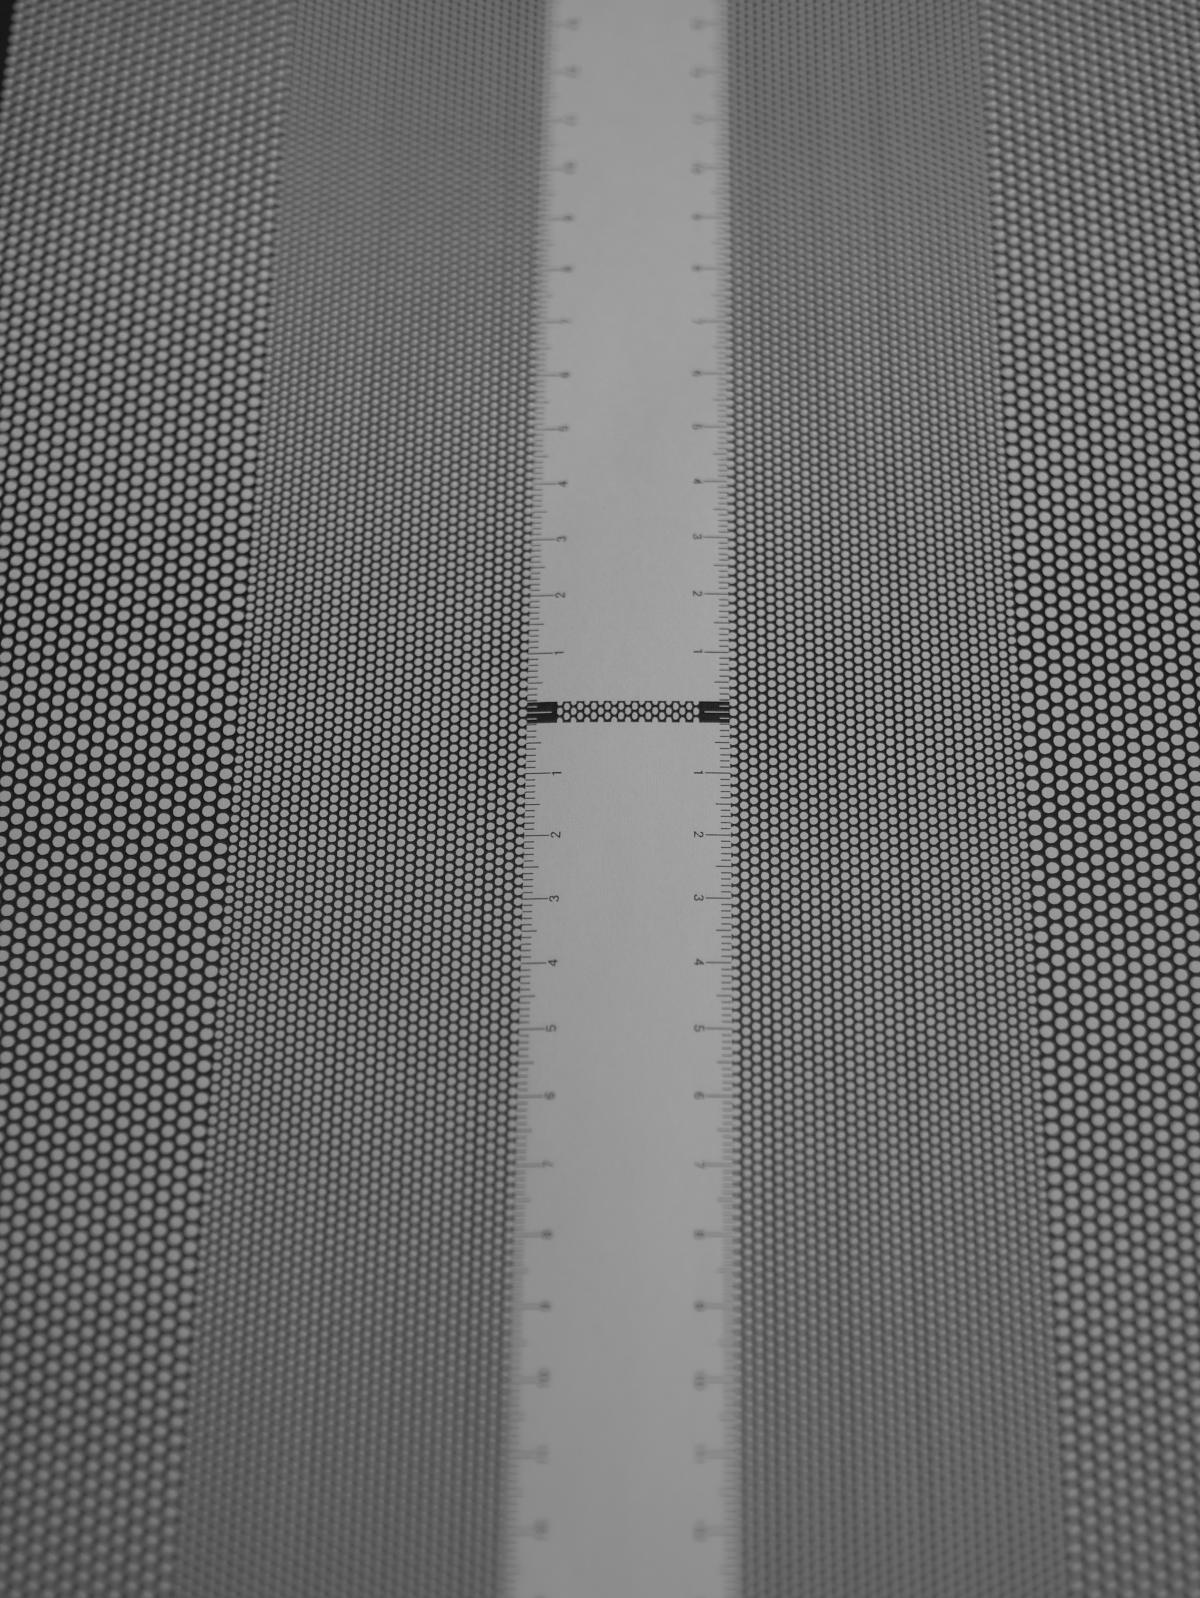 Flektogon 35mm F2.4 (後期型) レンズ性能_b0161171_18253174.jpg